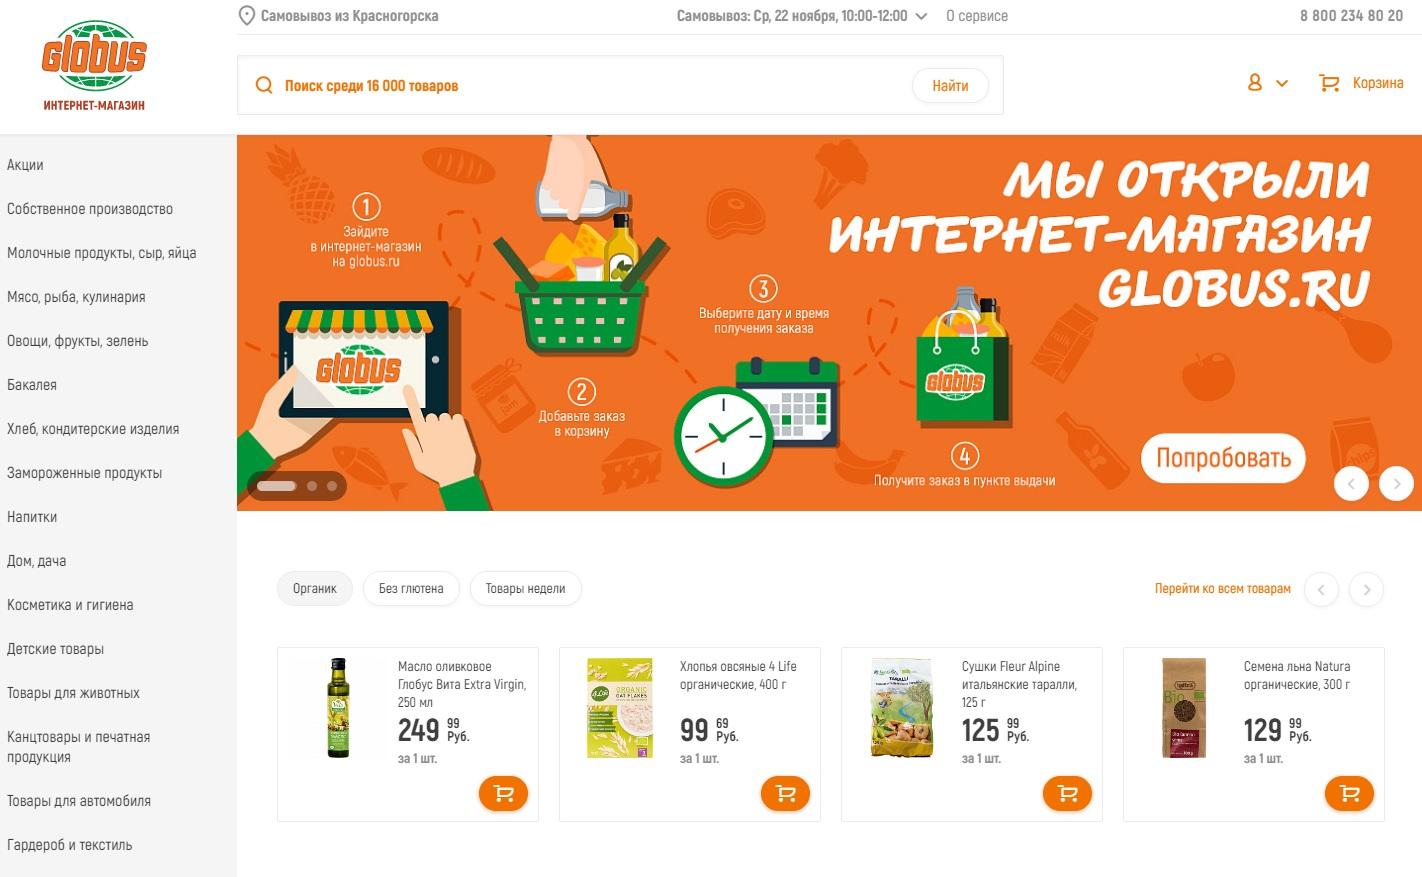 Интернет Магазин Глобус Москва